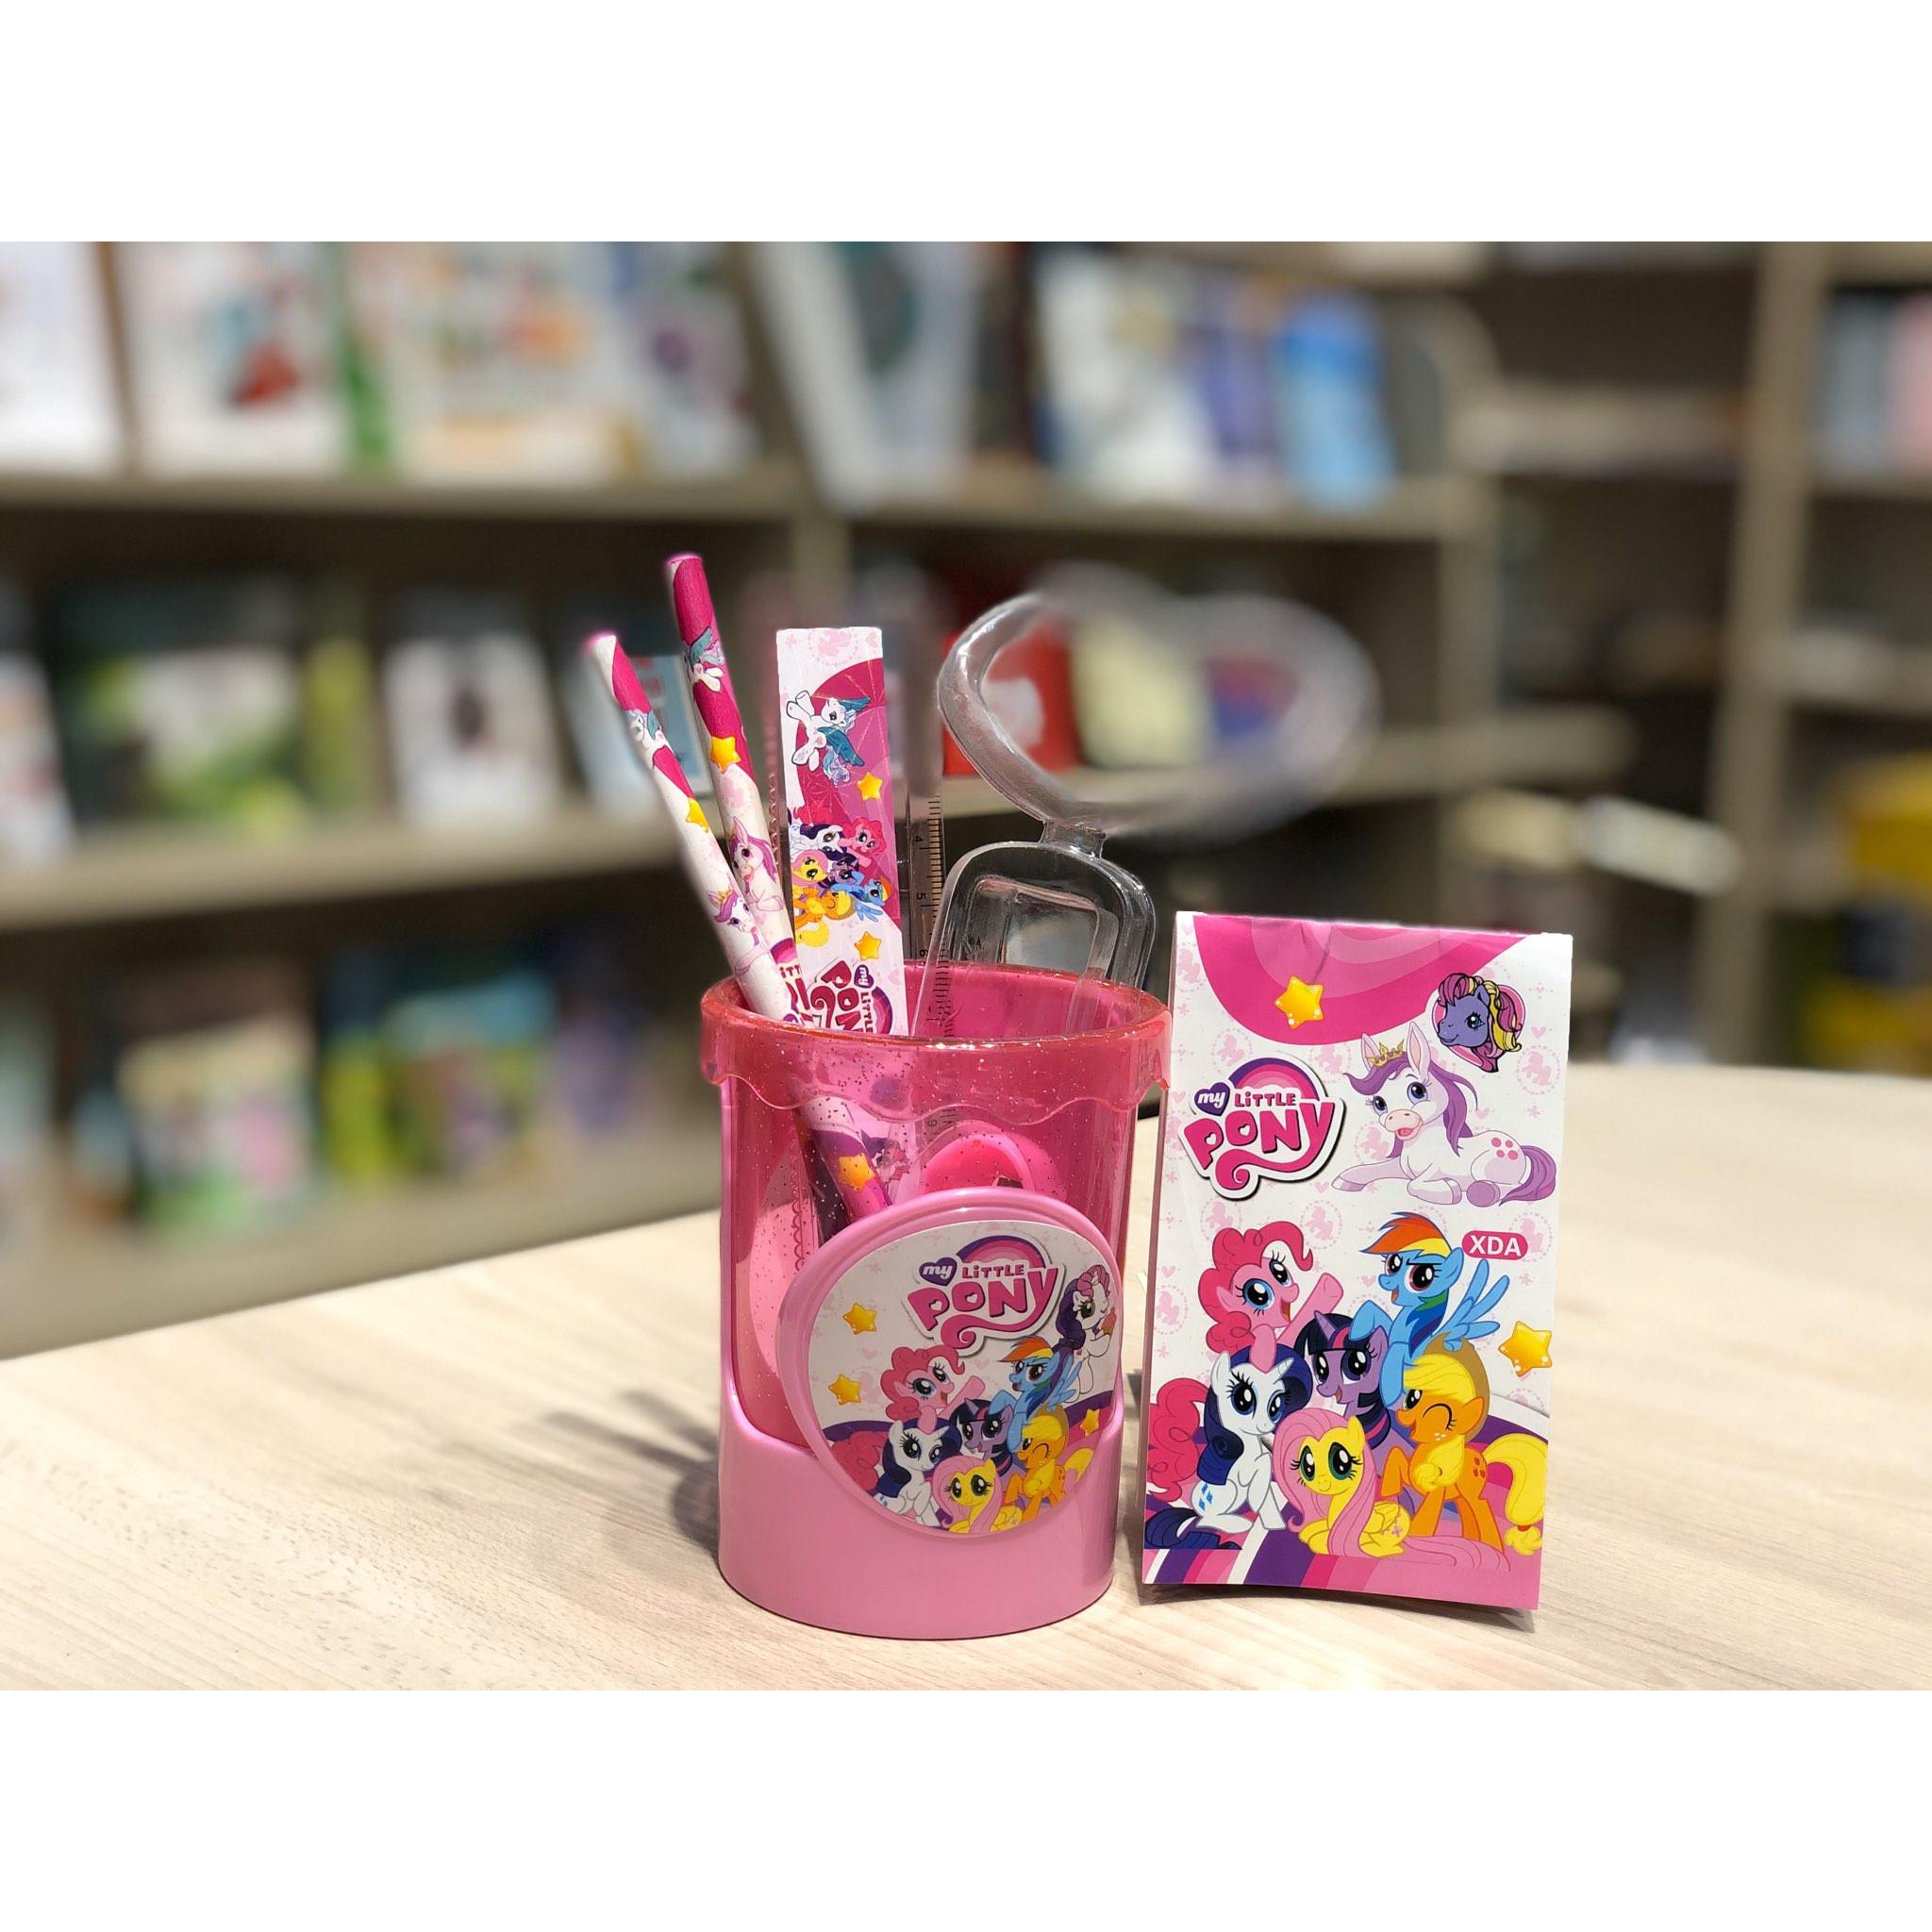 Cắm bút nhựa Cartoon hai lớp kèm dụng cụ học tập 7,5x10cm